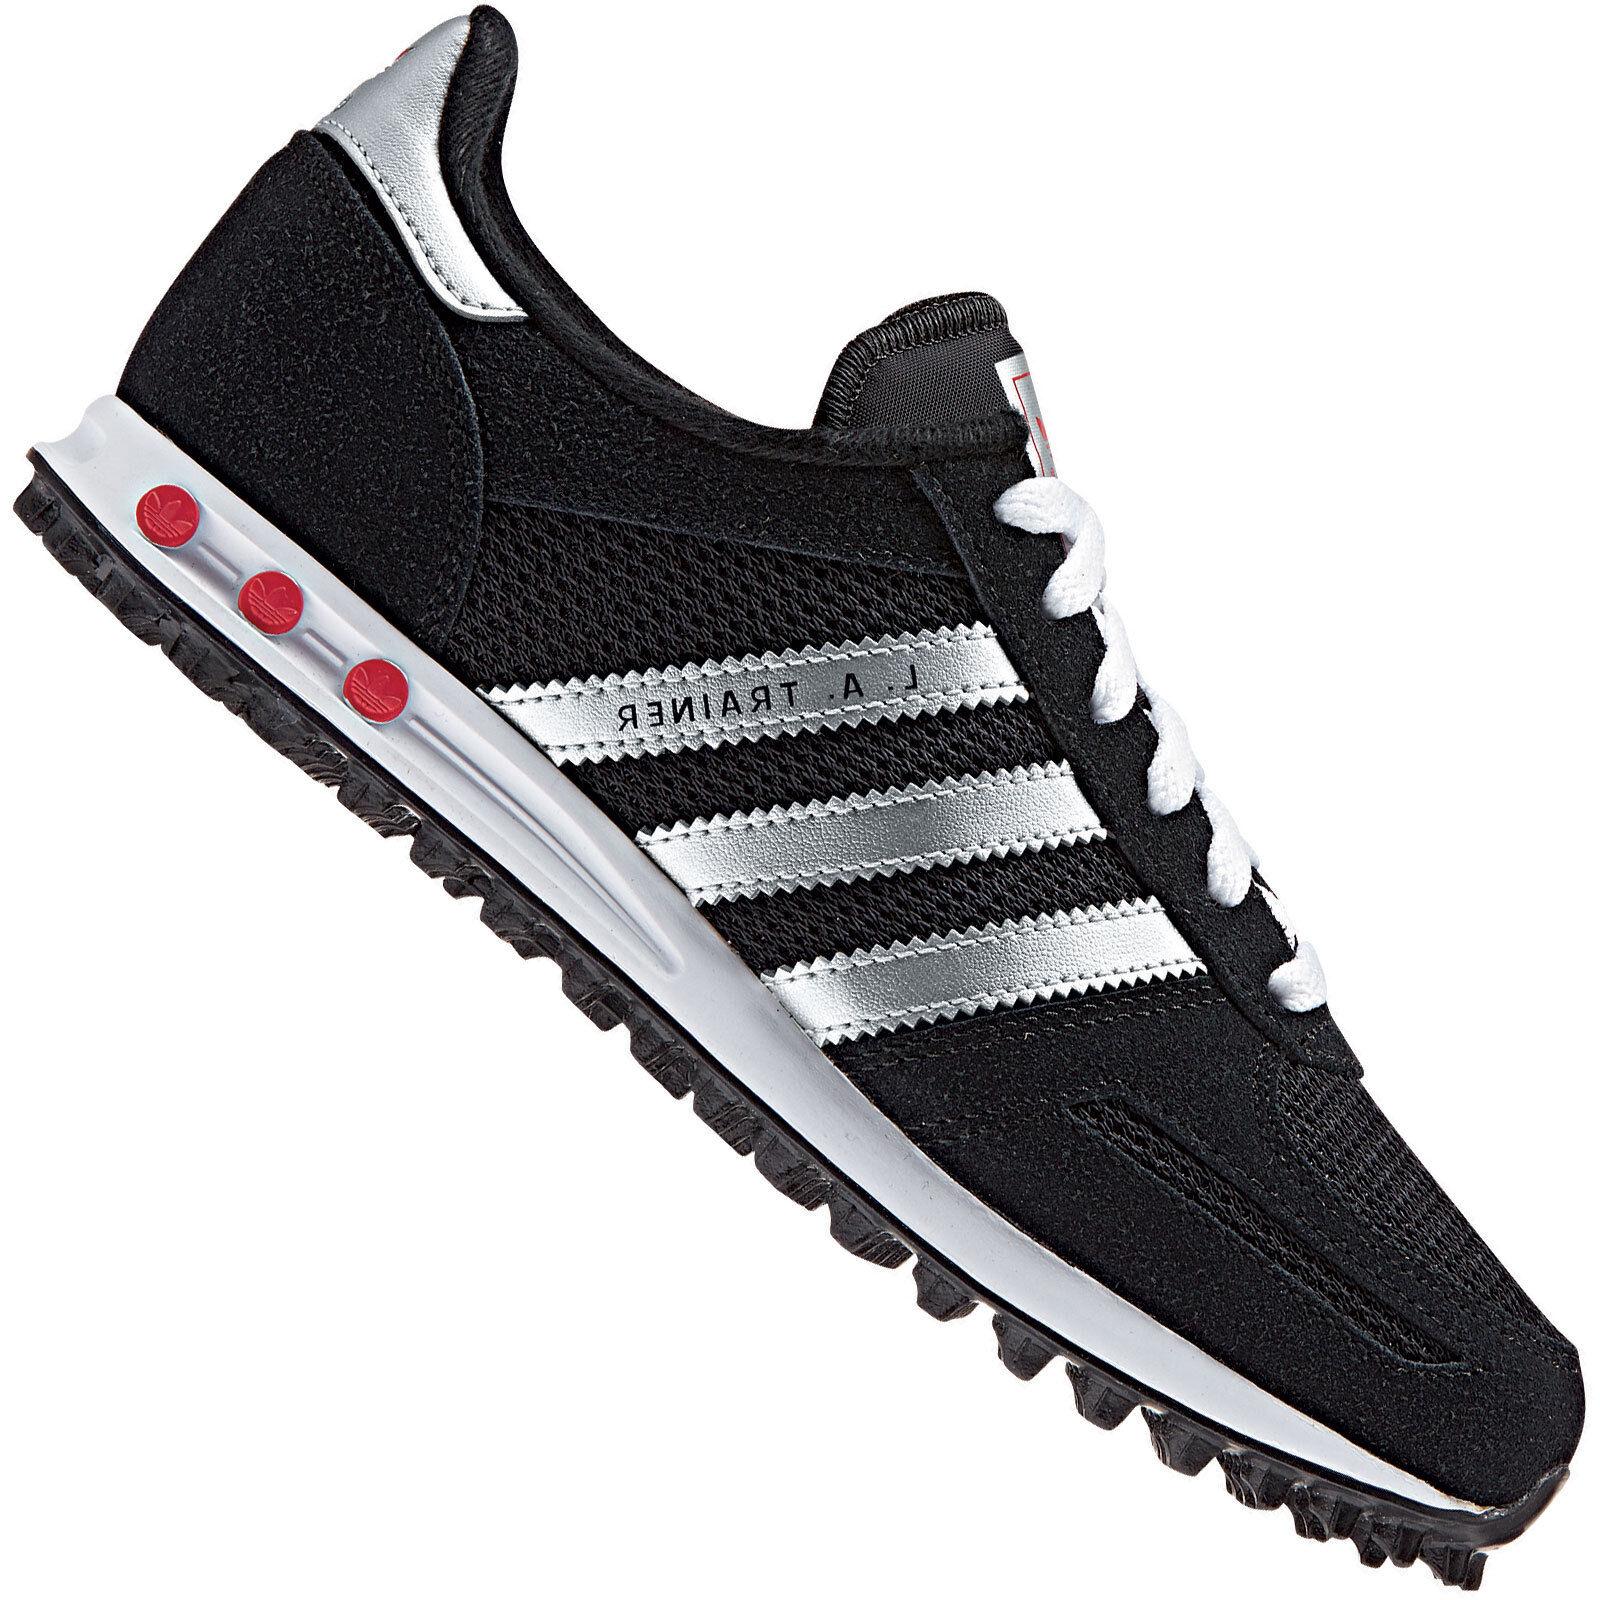 Adidas Originals Originals Adidas LA Trainer Damen-Sneaker Laufschuhe Turnschuhe Sportschuhe NEU ea405e